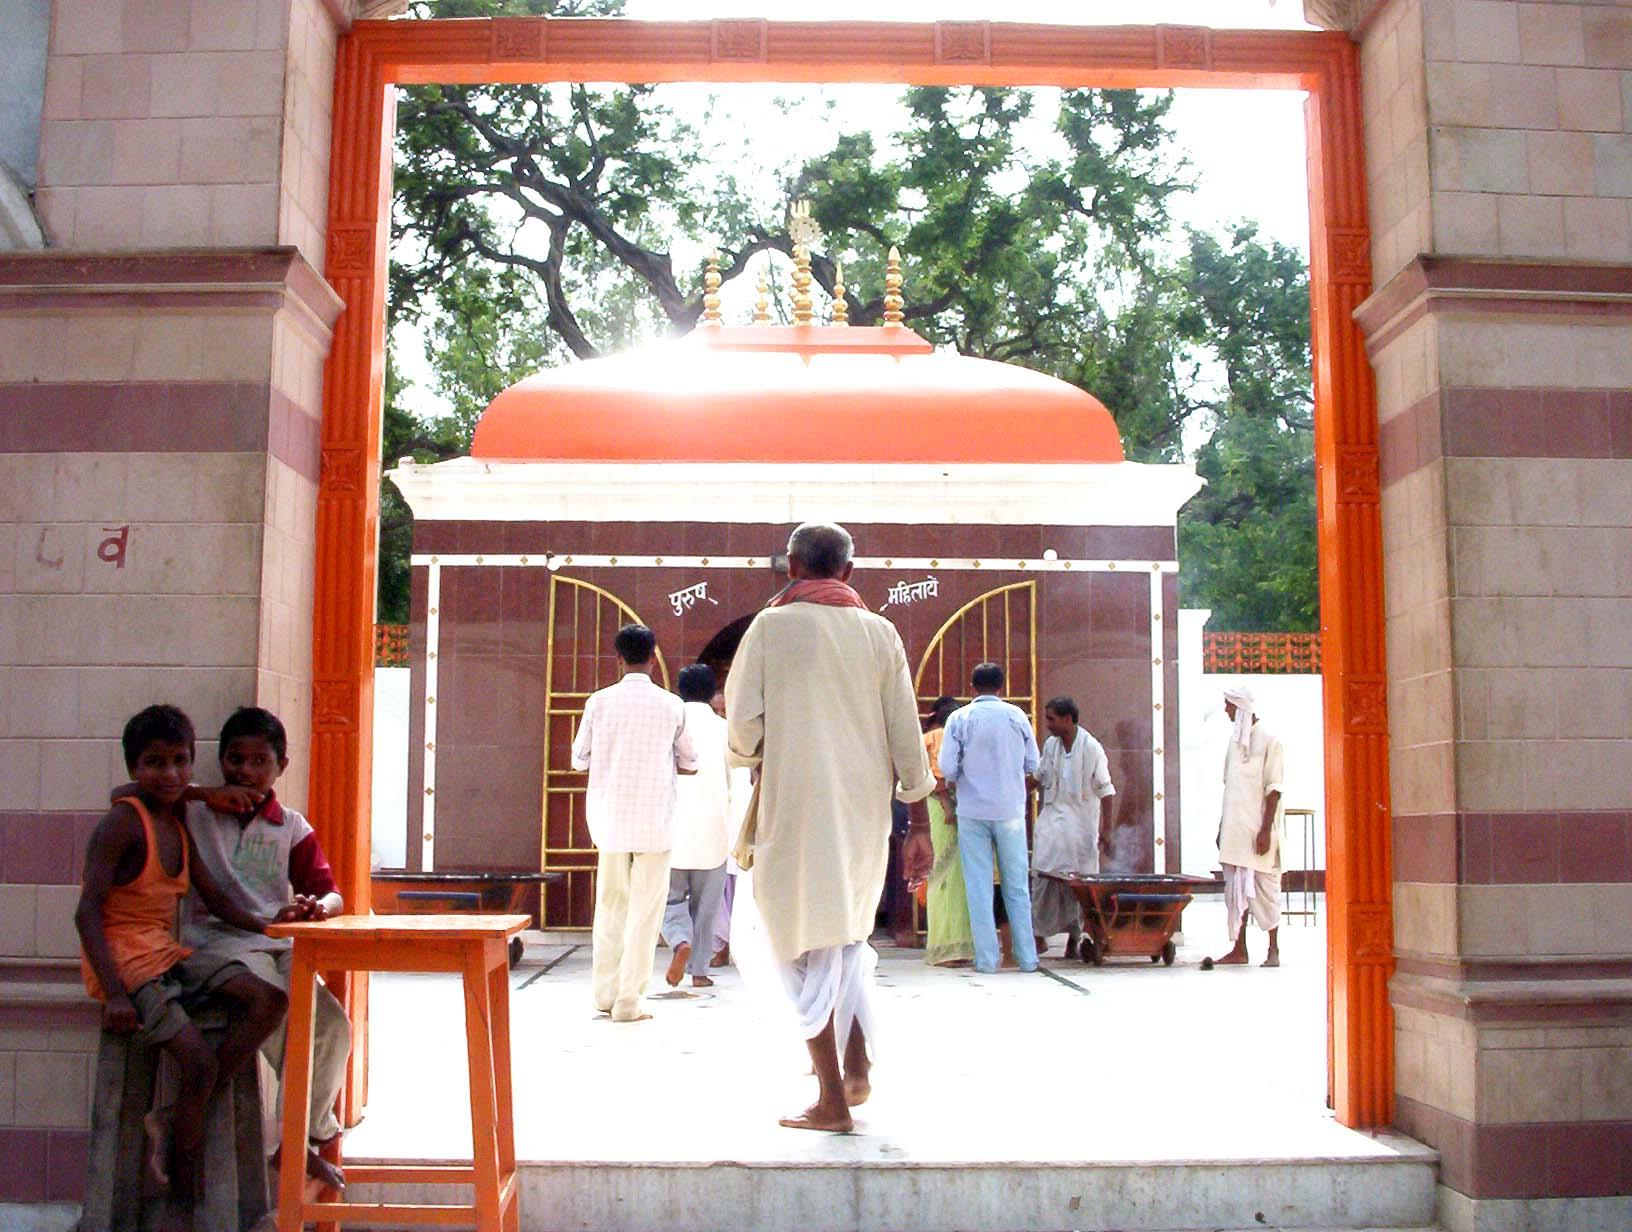 Maa Thawewali temple in Thawe